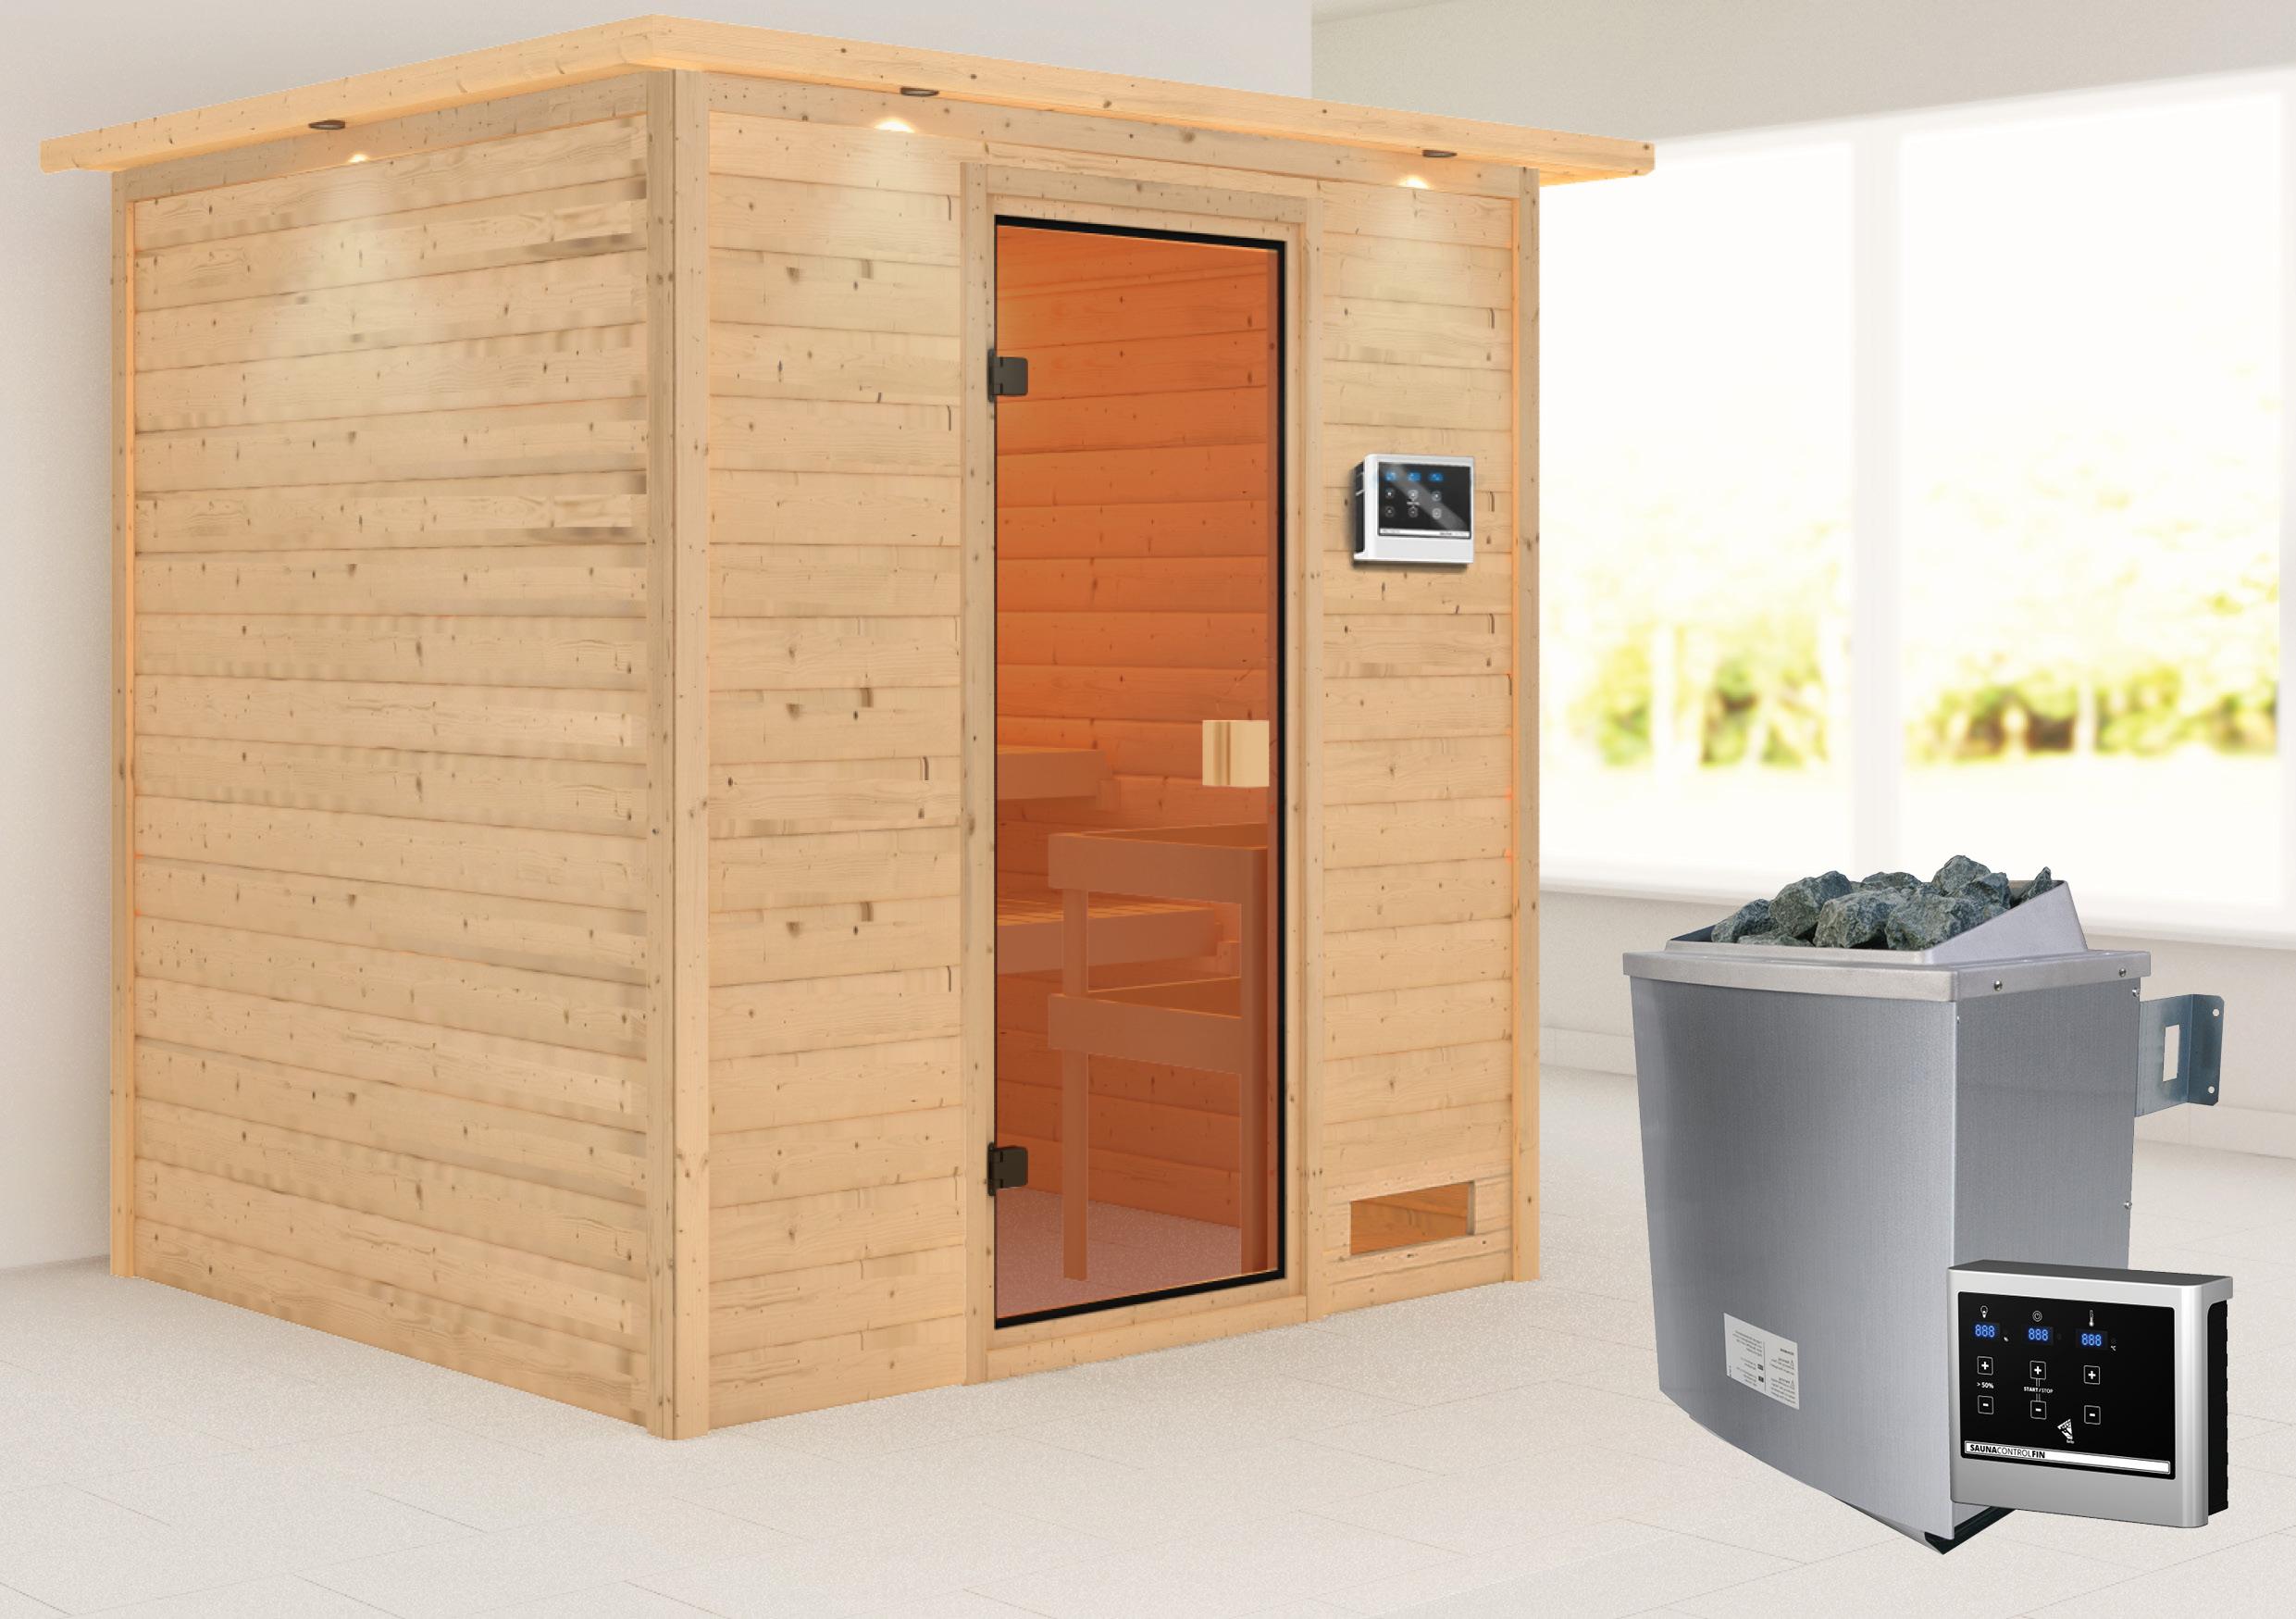 Woodfeeling Sauna Adelina 38mm Dachkranz Saunaofen 9kW extern Bild 1